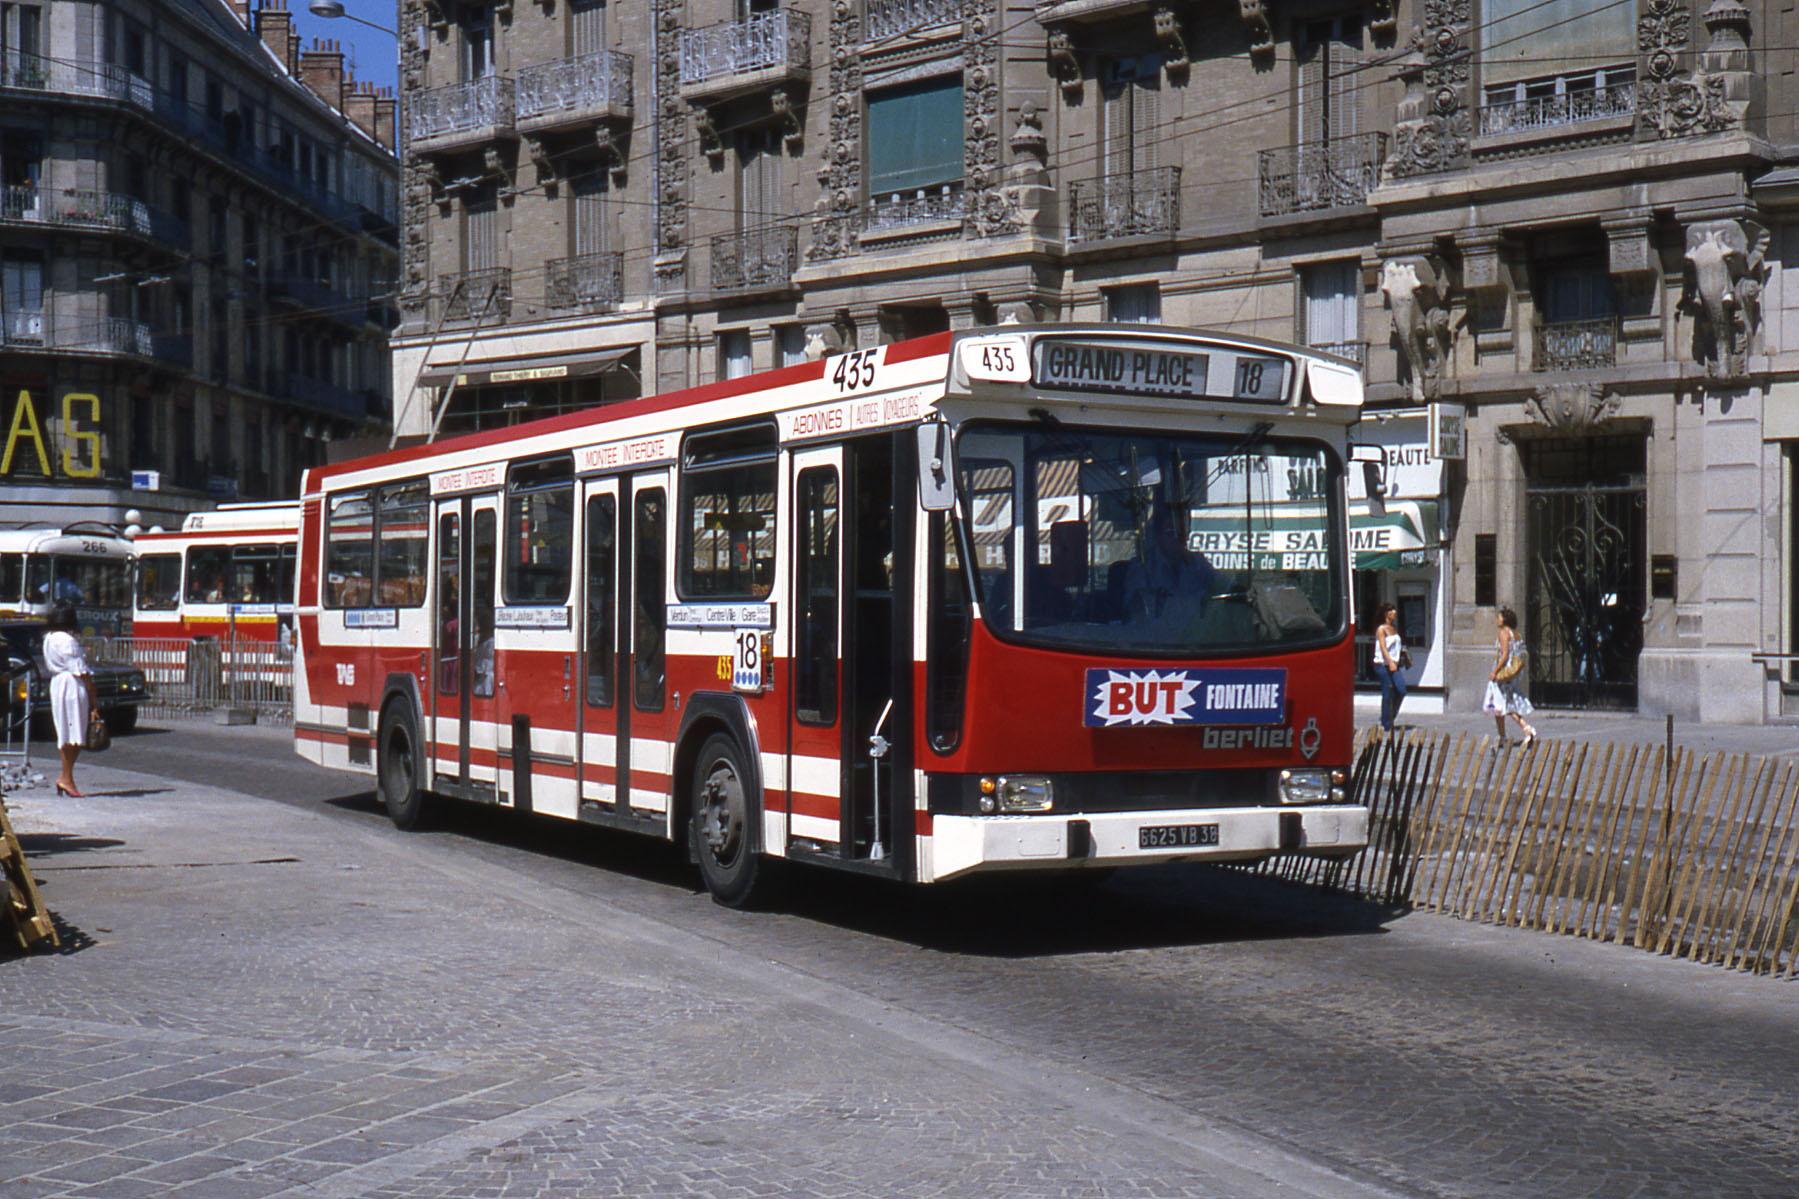 Renault pr 100 - Bus grenoble lyon ...